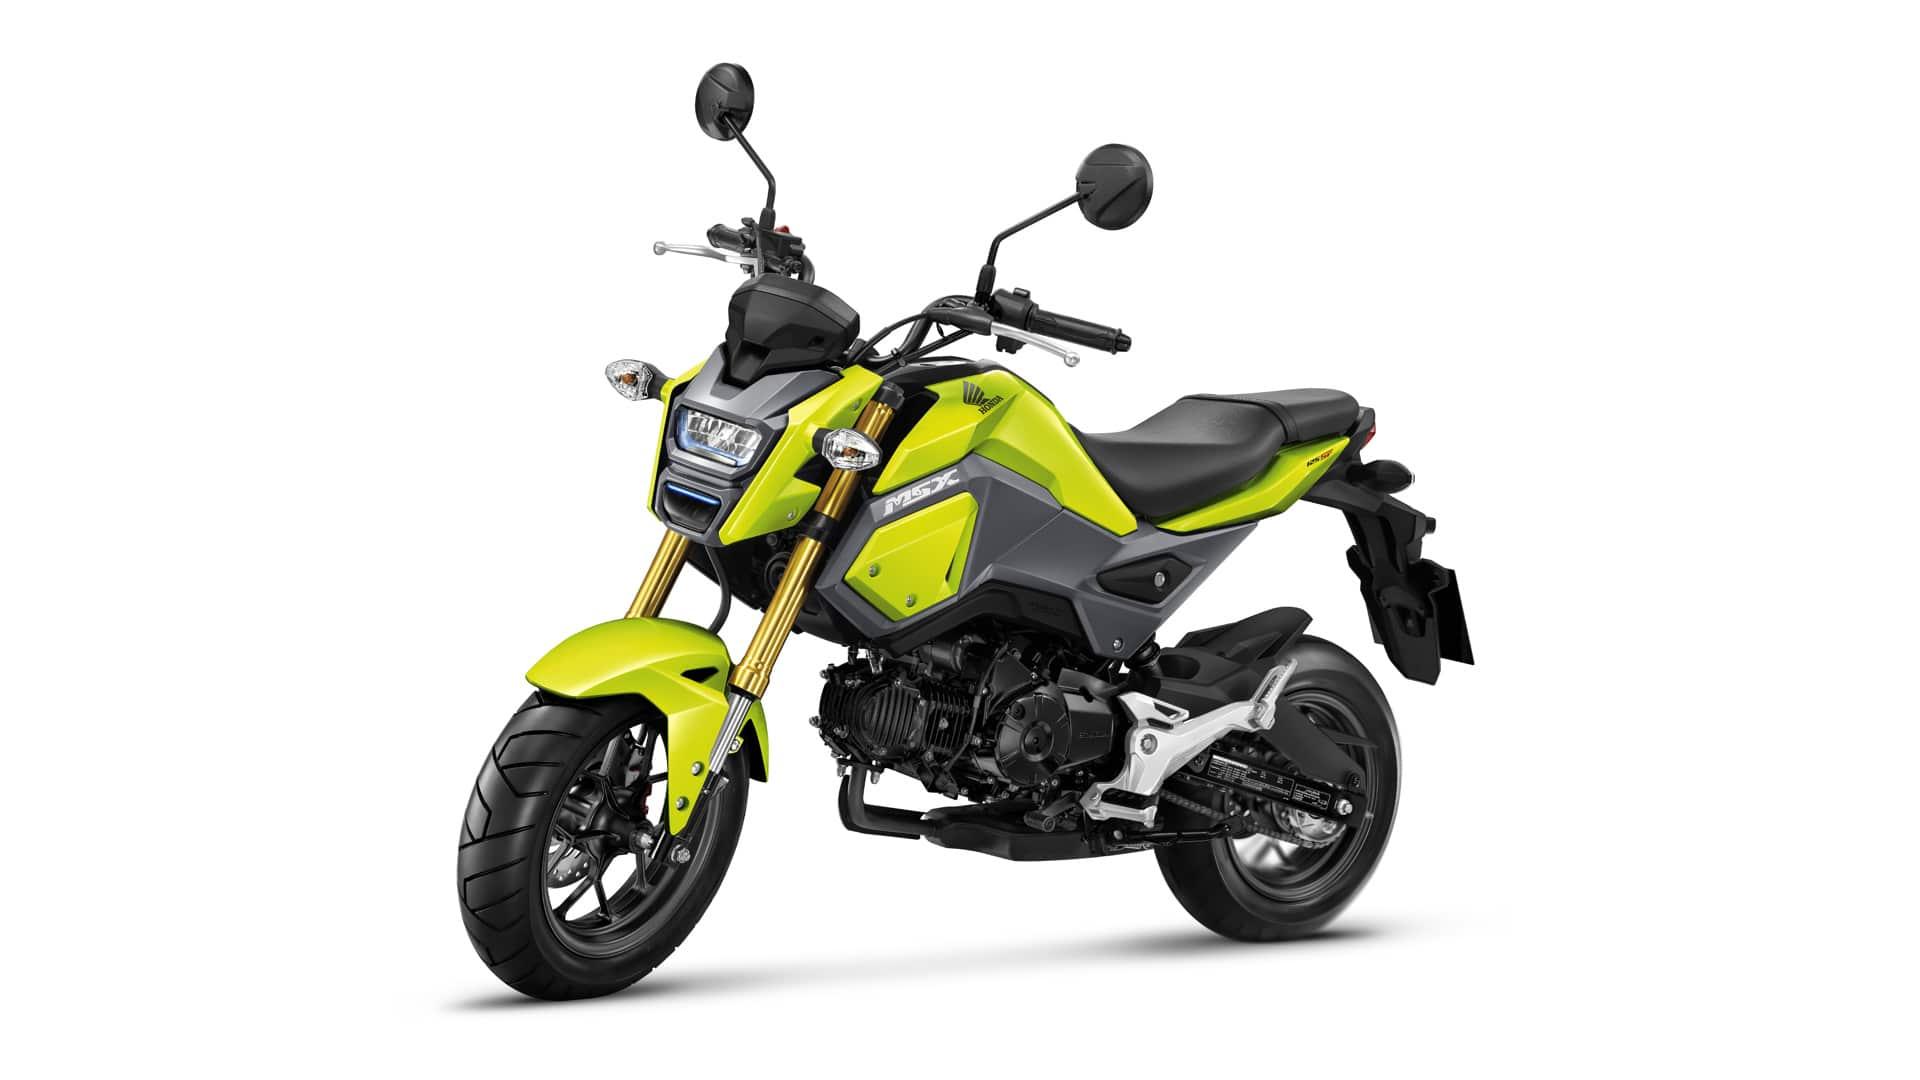 2016 Honda Motorcycles Grom Newhairstylesformen2014 Com